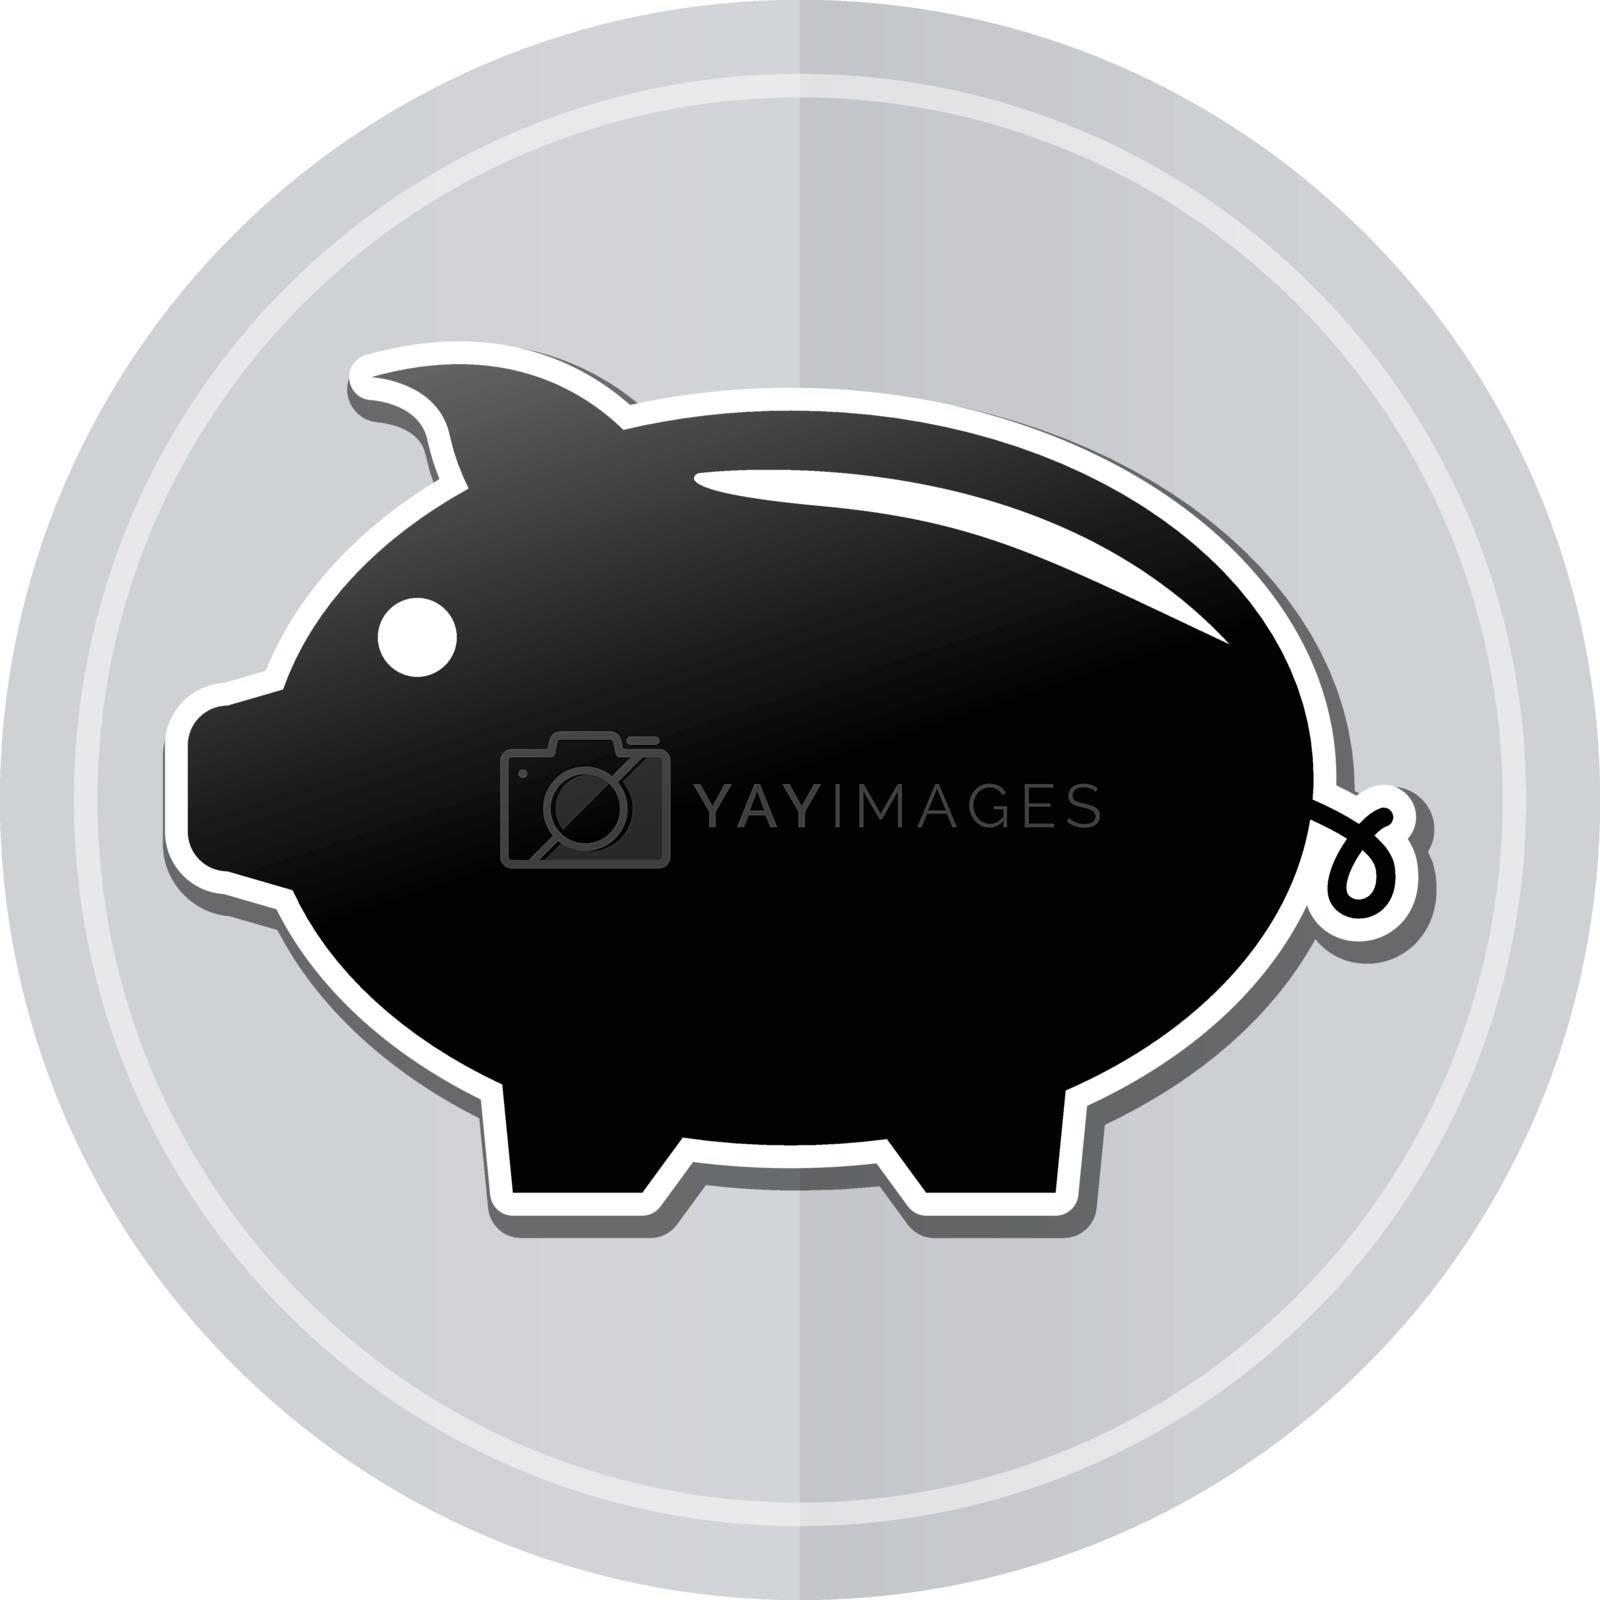 Illustration of piggybank sticker icon simple design